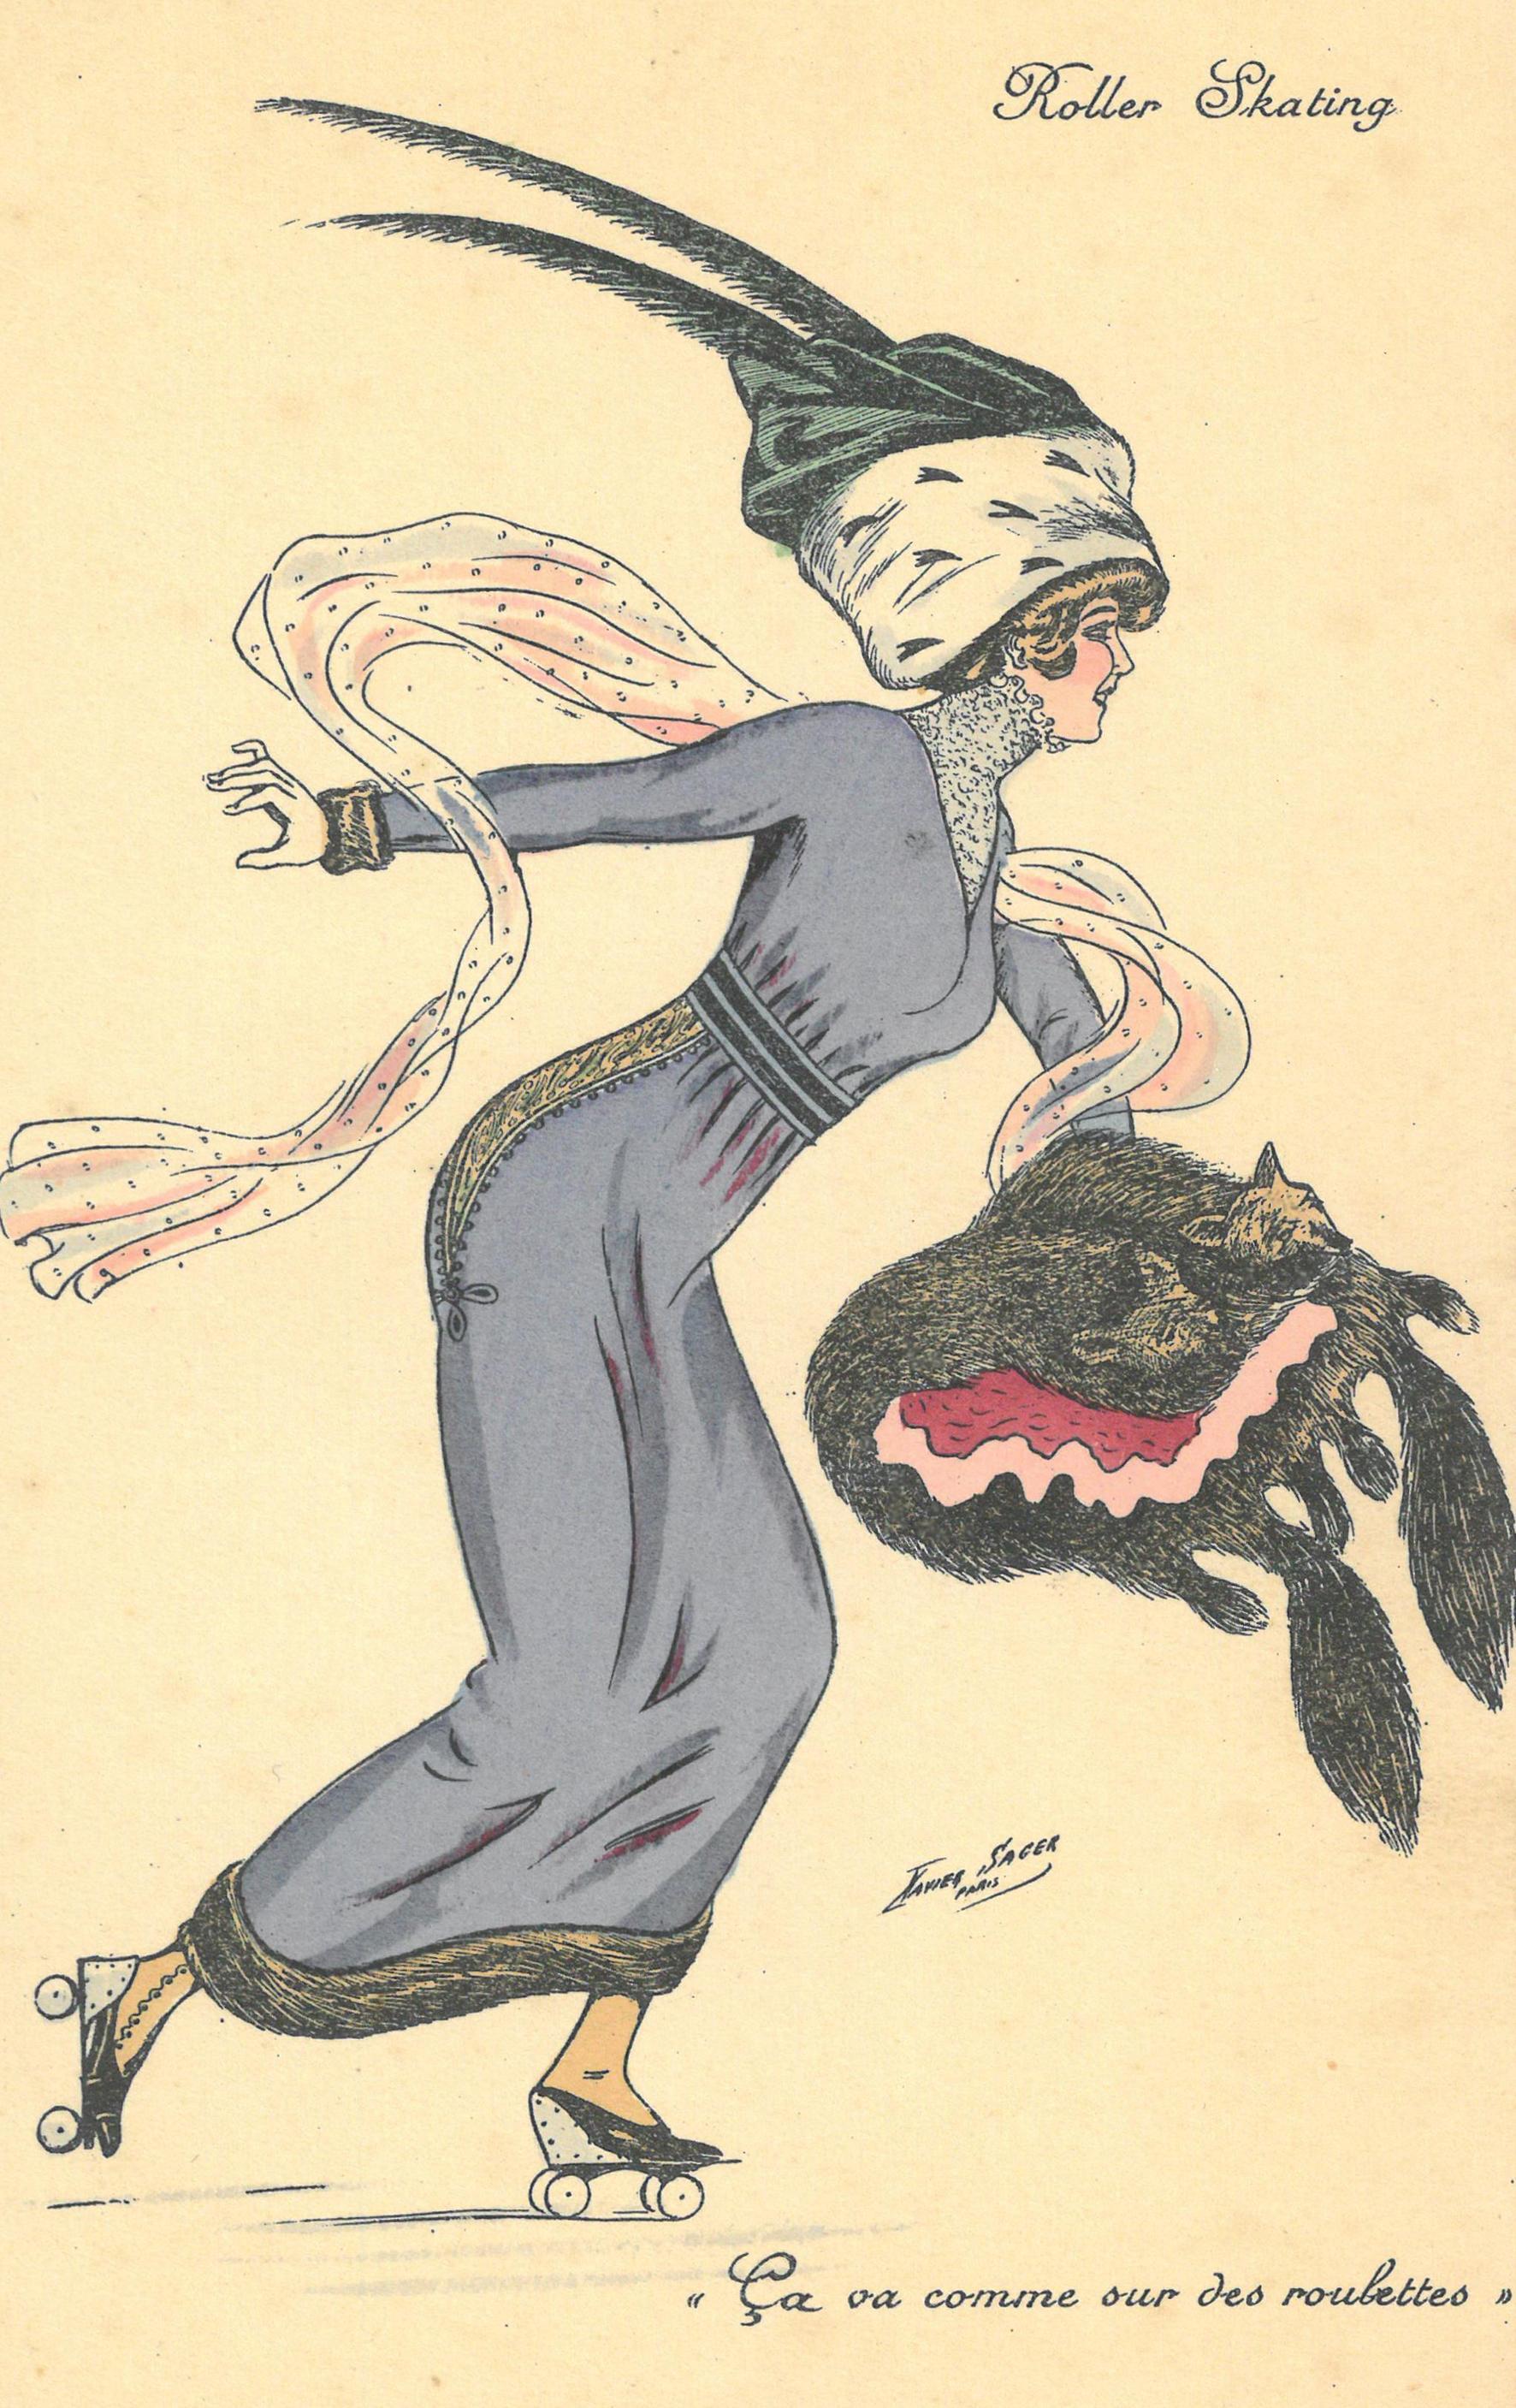 dessin-mode-ca-va-comme-sur-des-roulettes-xavier-sager-fashioning winter-somerset-house